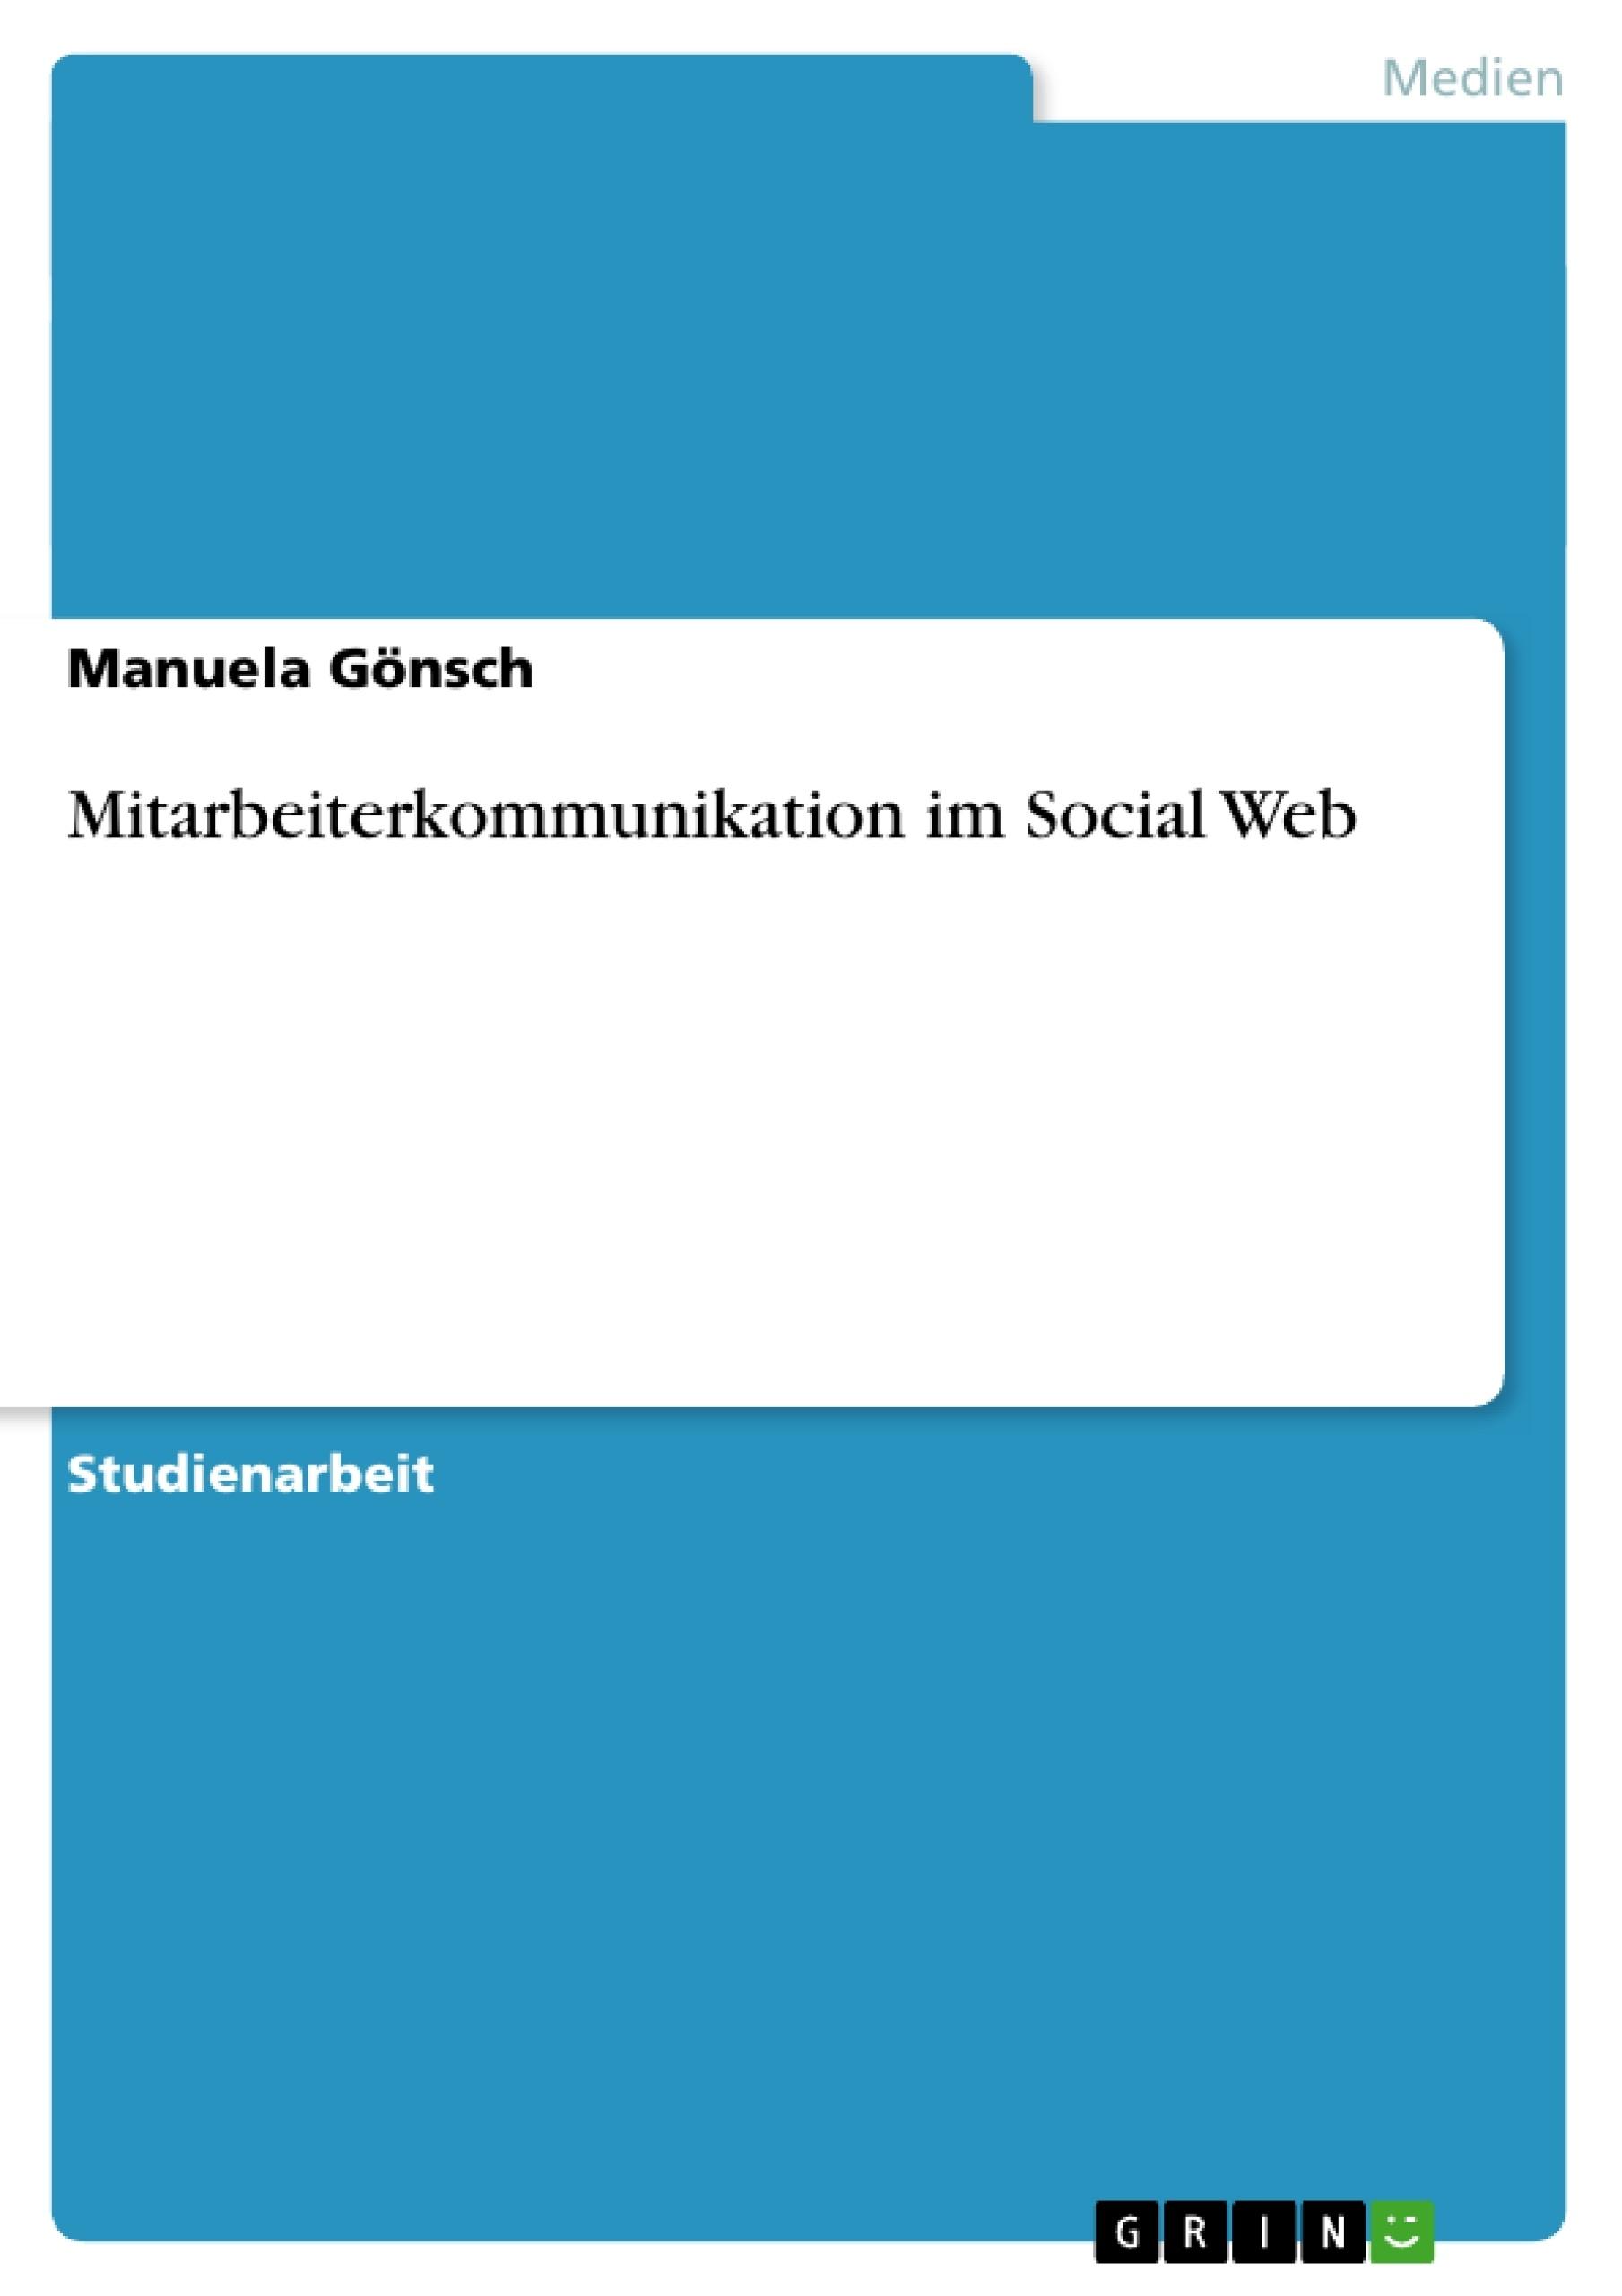 Titel: Mitarbeiterkommunikation im Social Web